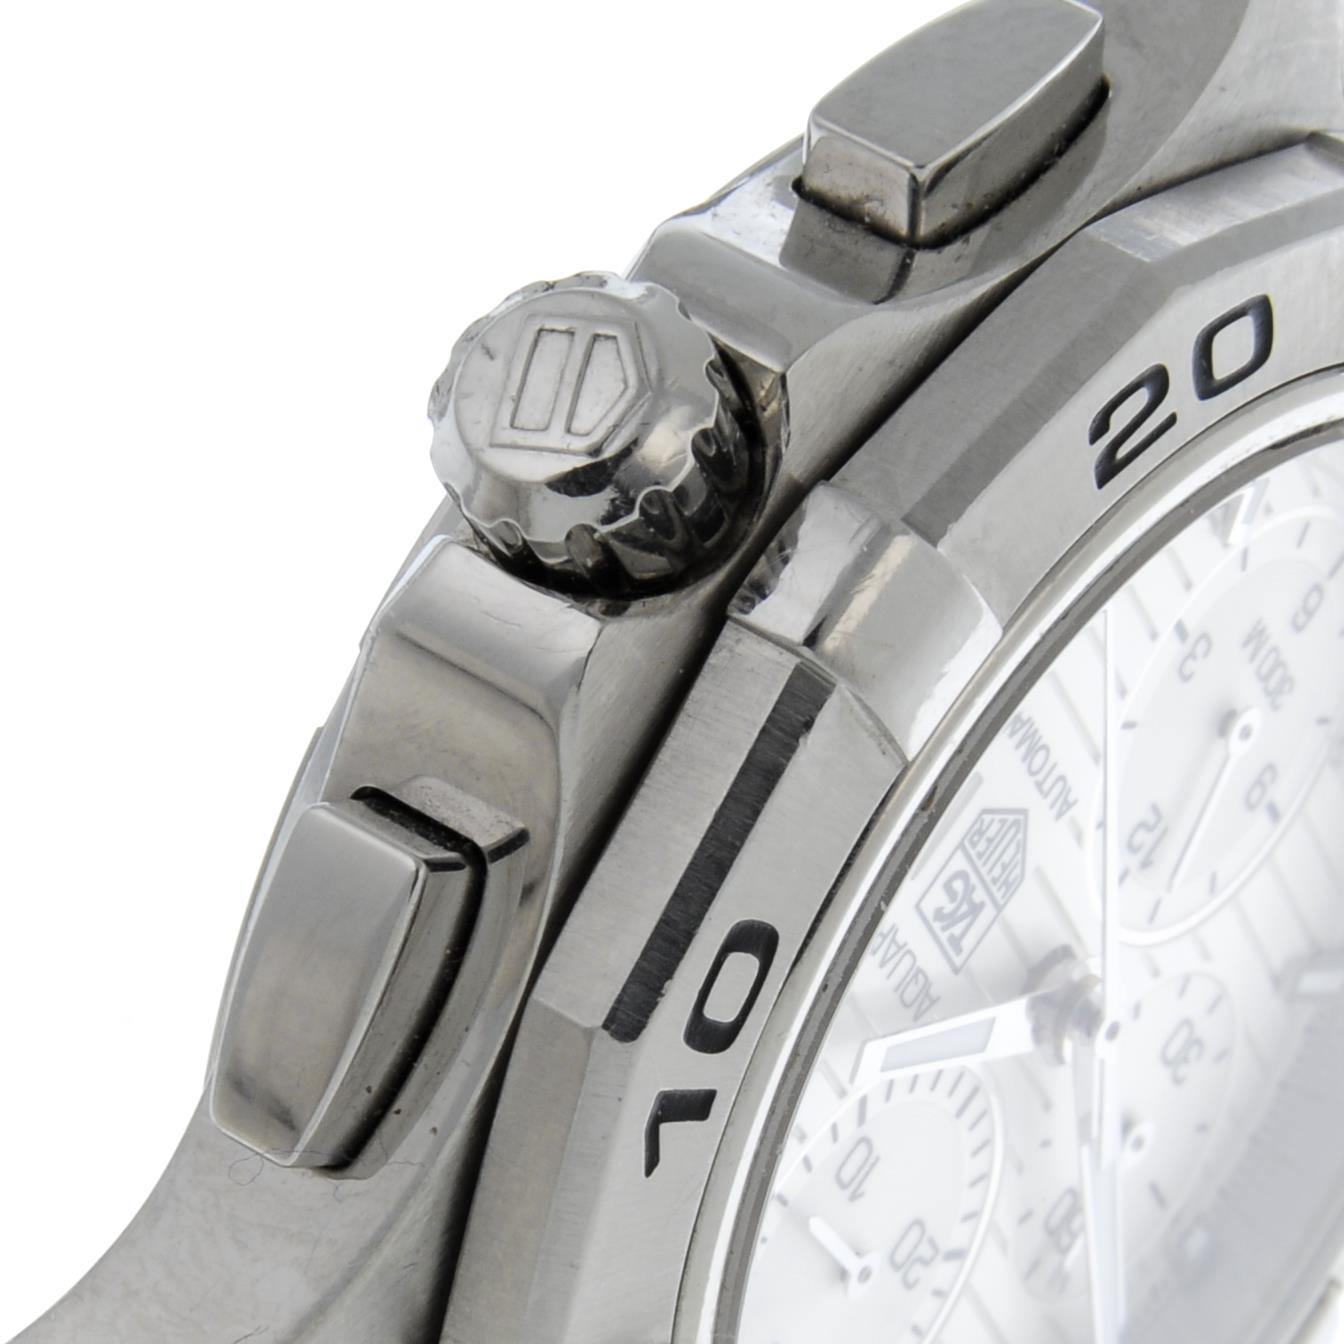 TAG HEUER - an Aquaracerchronograph bracelet watch. - Image 4 of 5